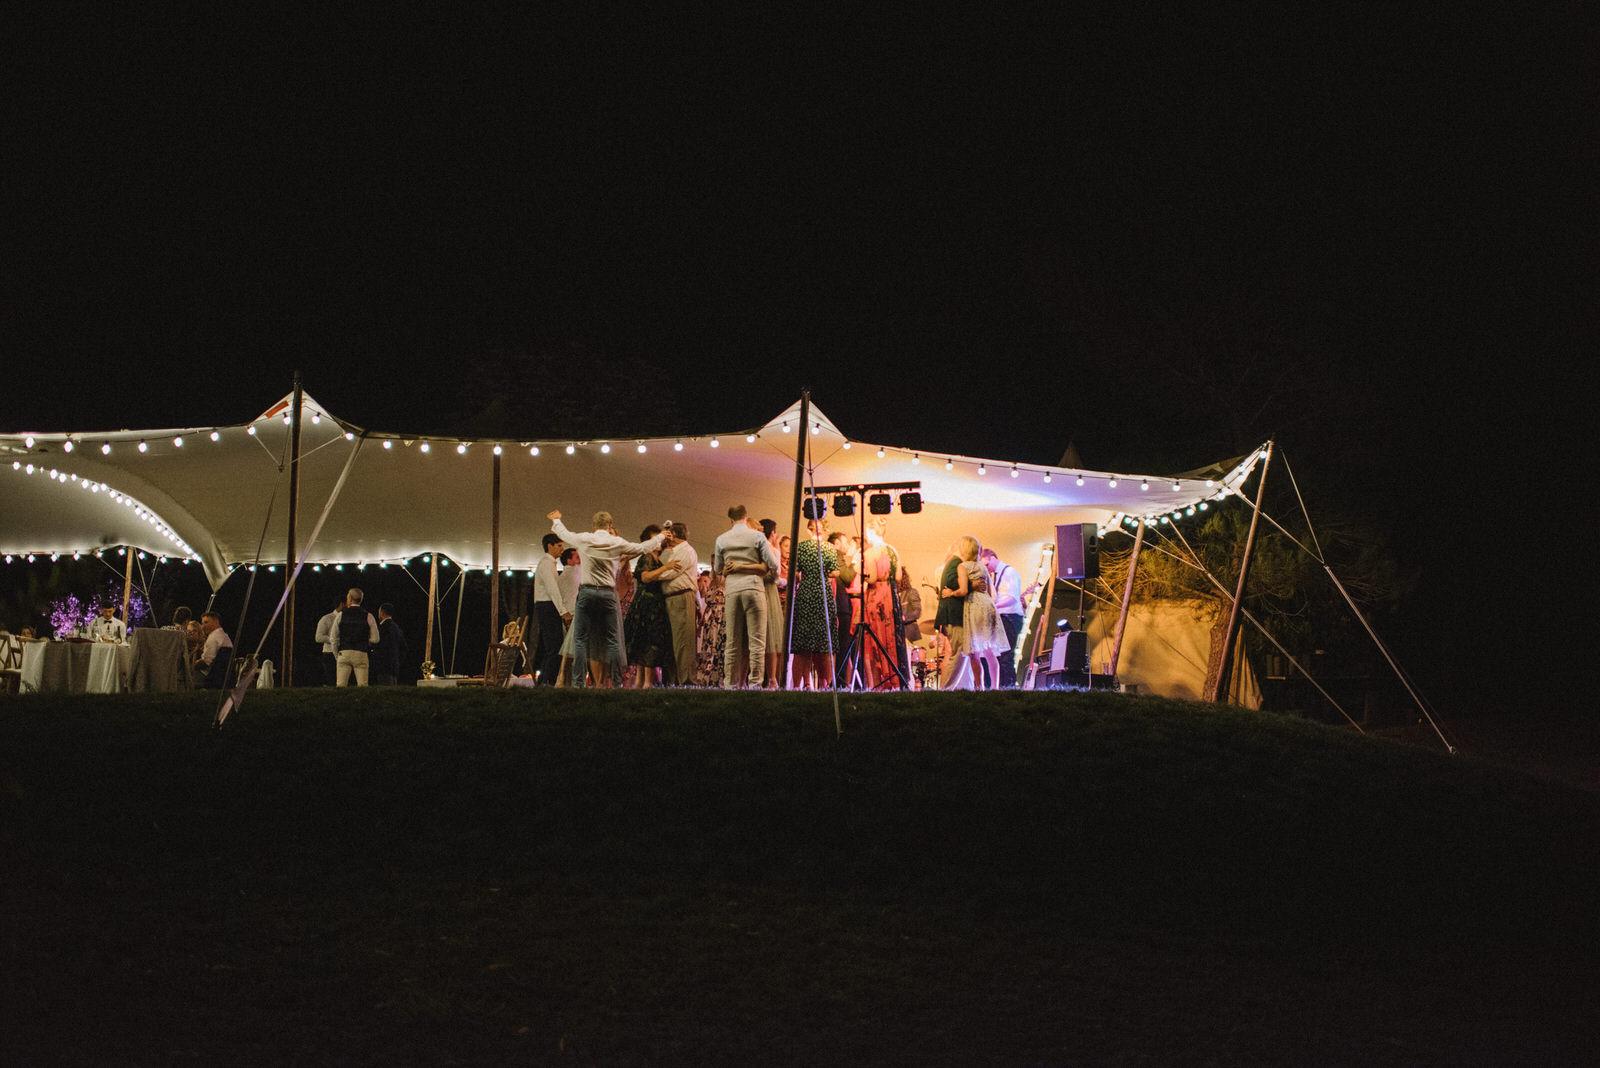 047-LOURMARIN-WEDDING-PHOTOGRAPHER-PROVENCE-WEDDING-ALTERNATIVE-WEDDING-PHOTOGRAPHY-FRANCE-PROVENCE-GARDEN-WEDDING.JPG